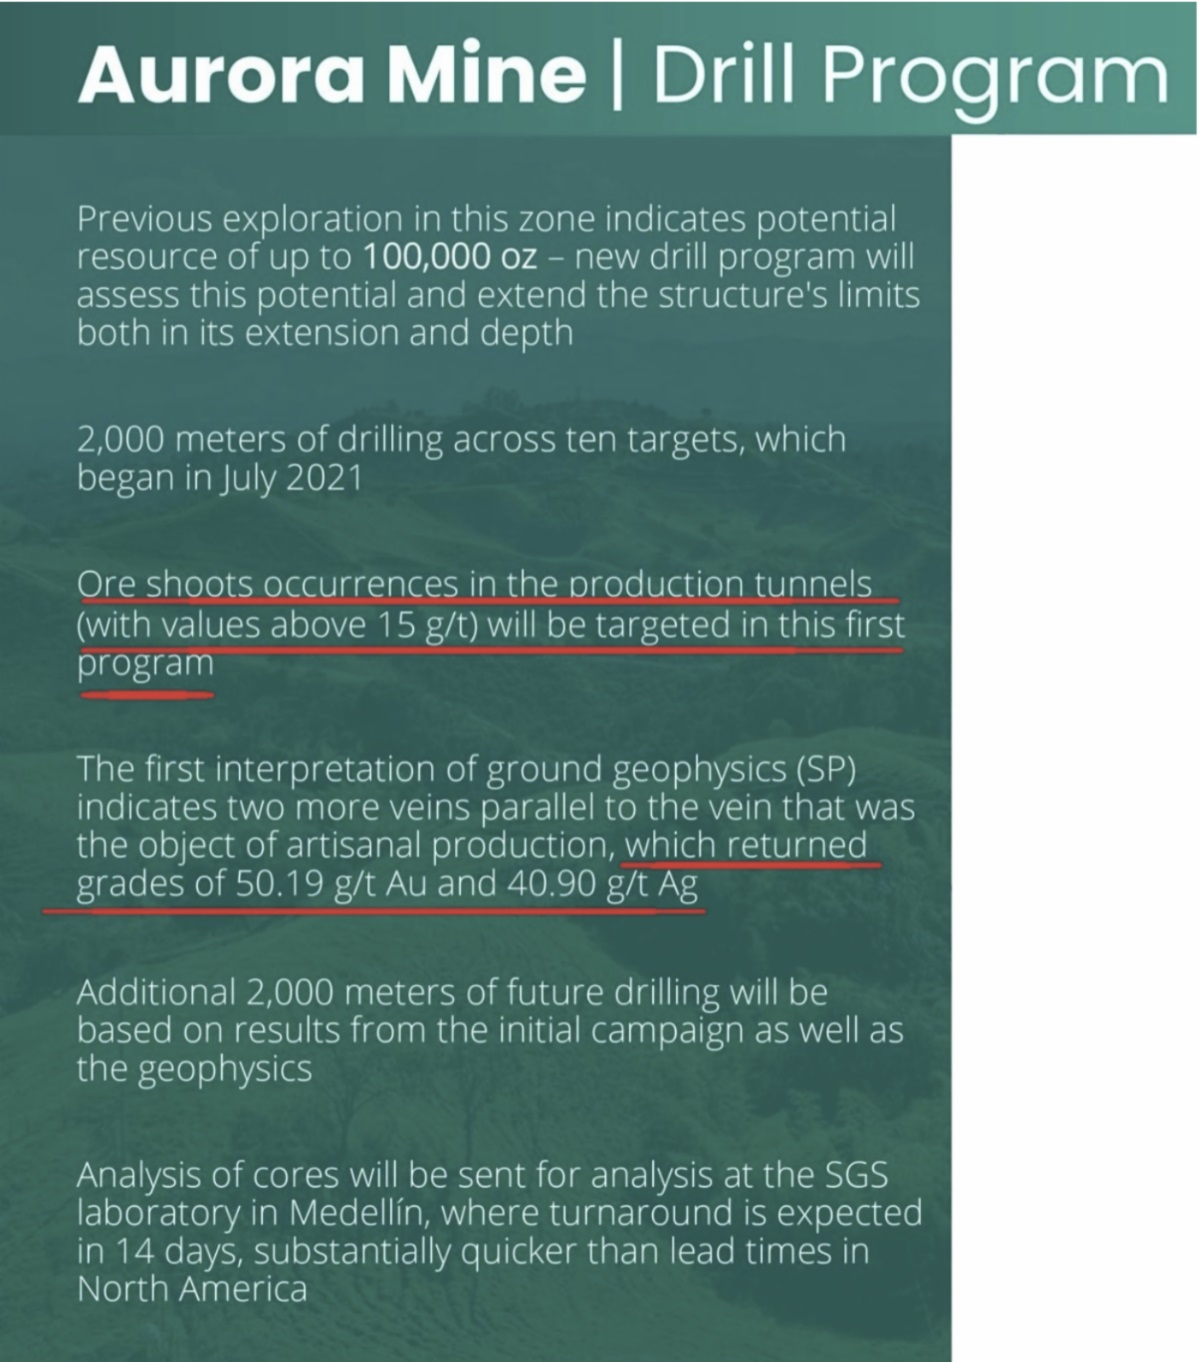 Aurora Mine Drill Program